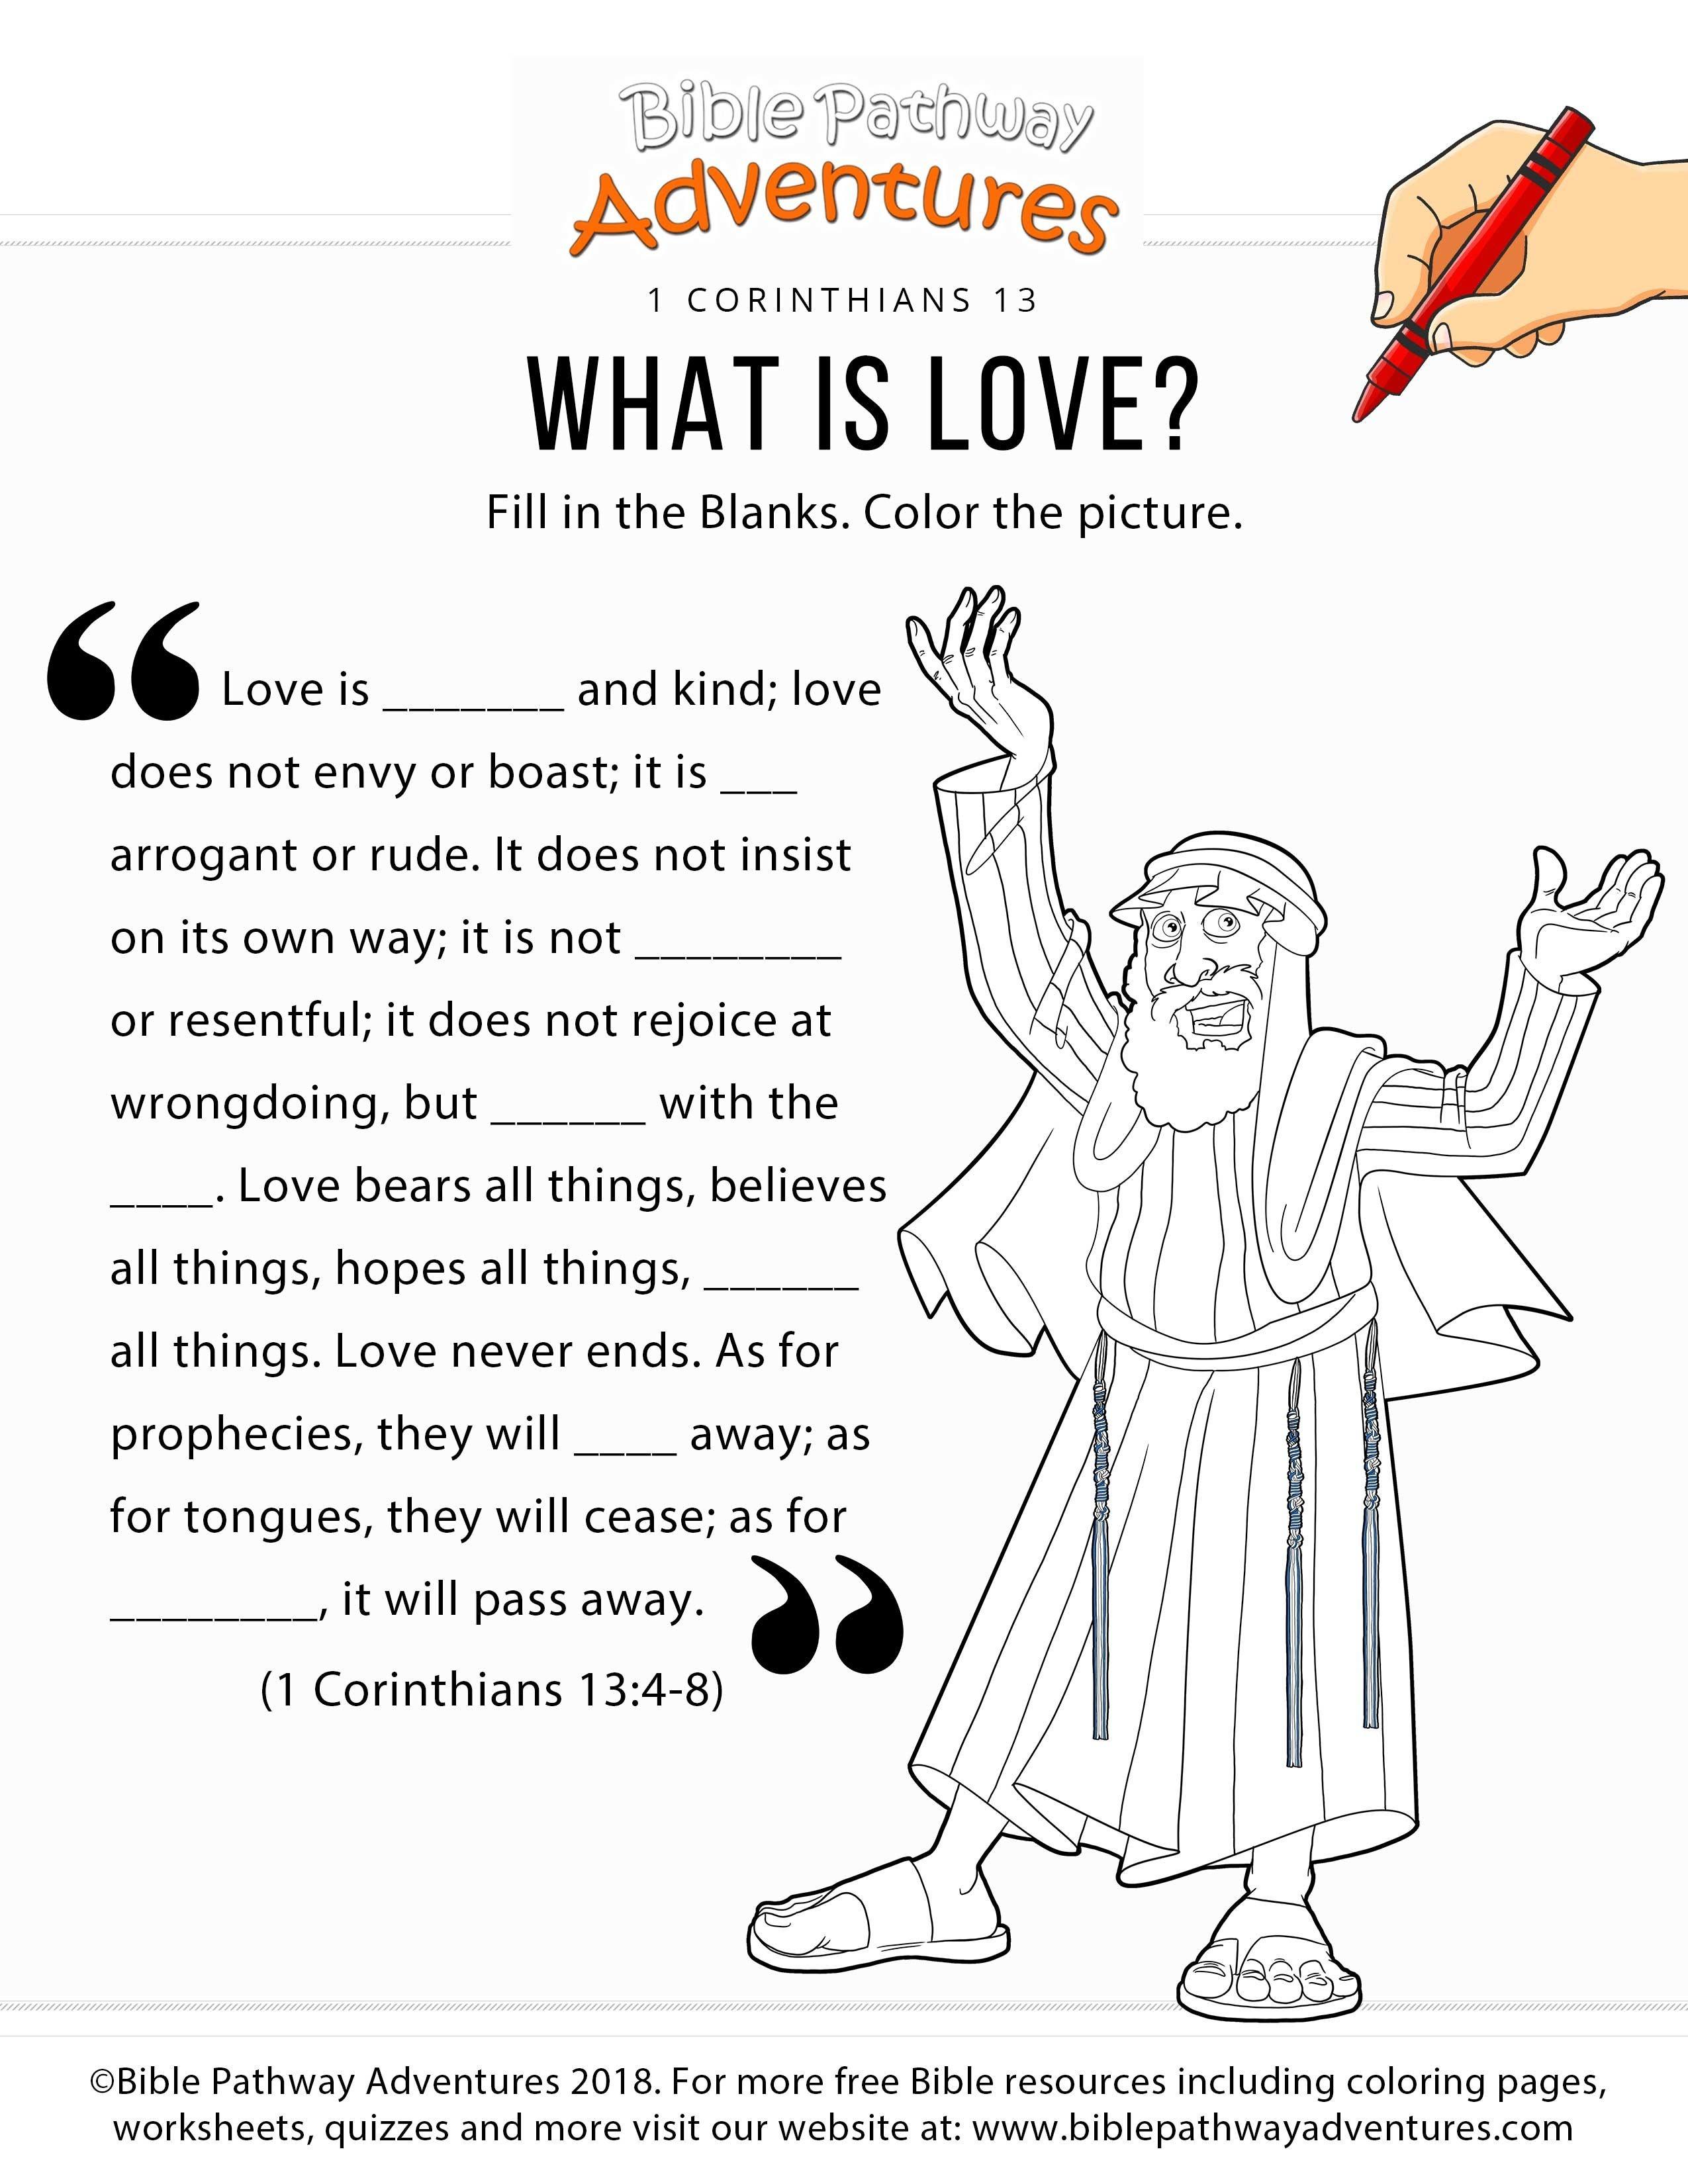 1 Corinthians 13 Bible Worksheet For Kids | Sunday School | Kids - Free Printable Children's Bible Lessons Worksheets